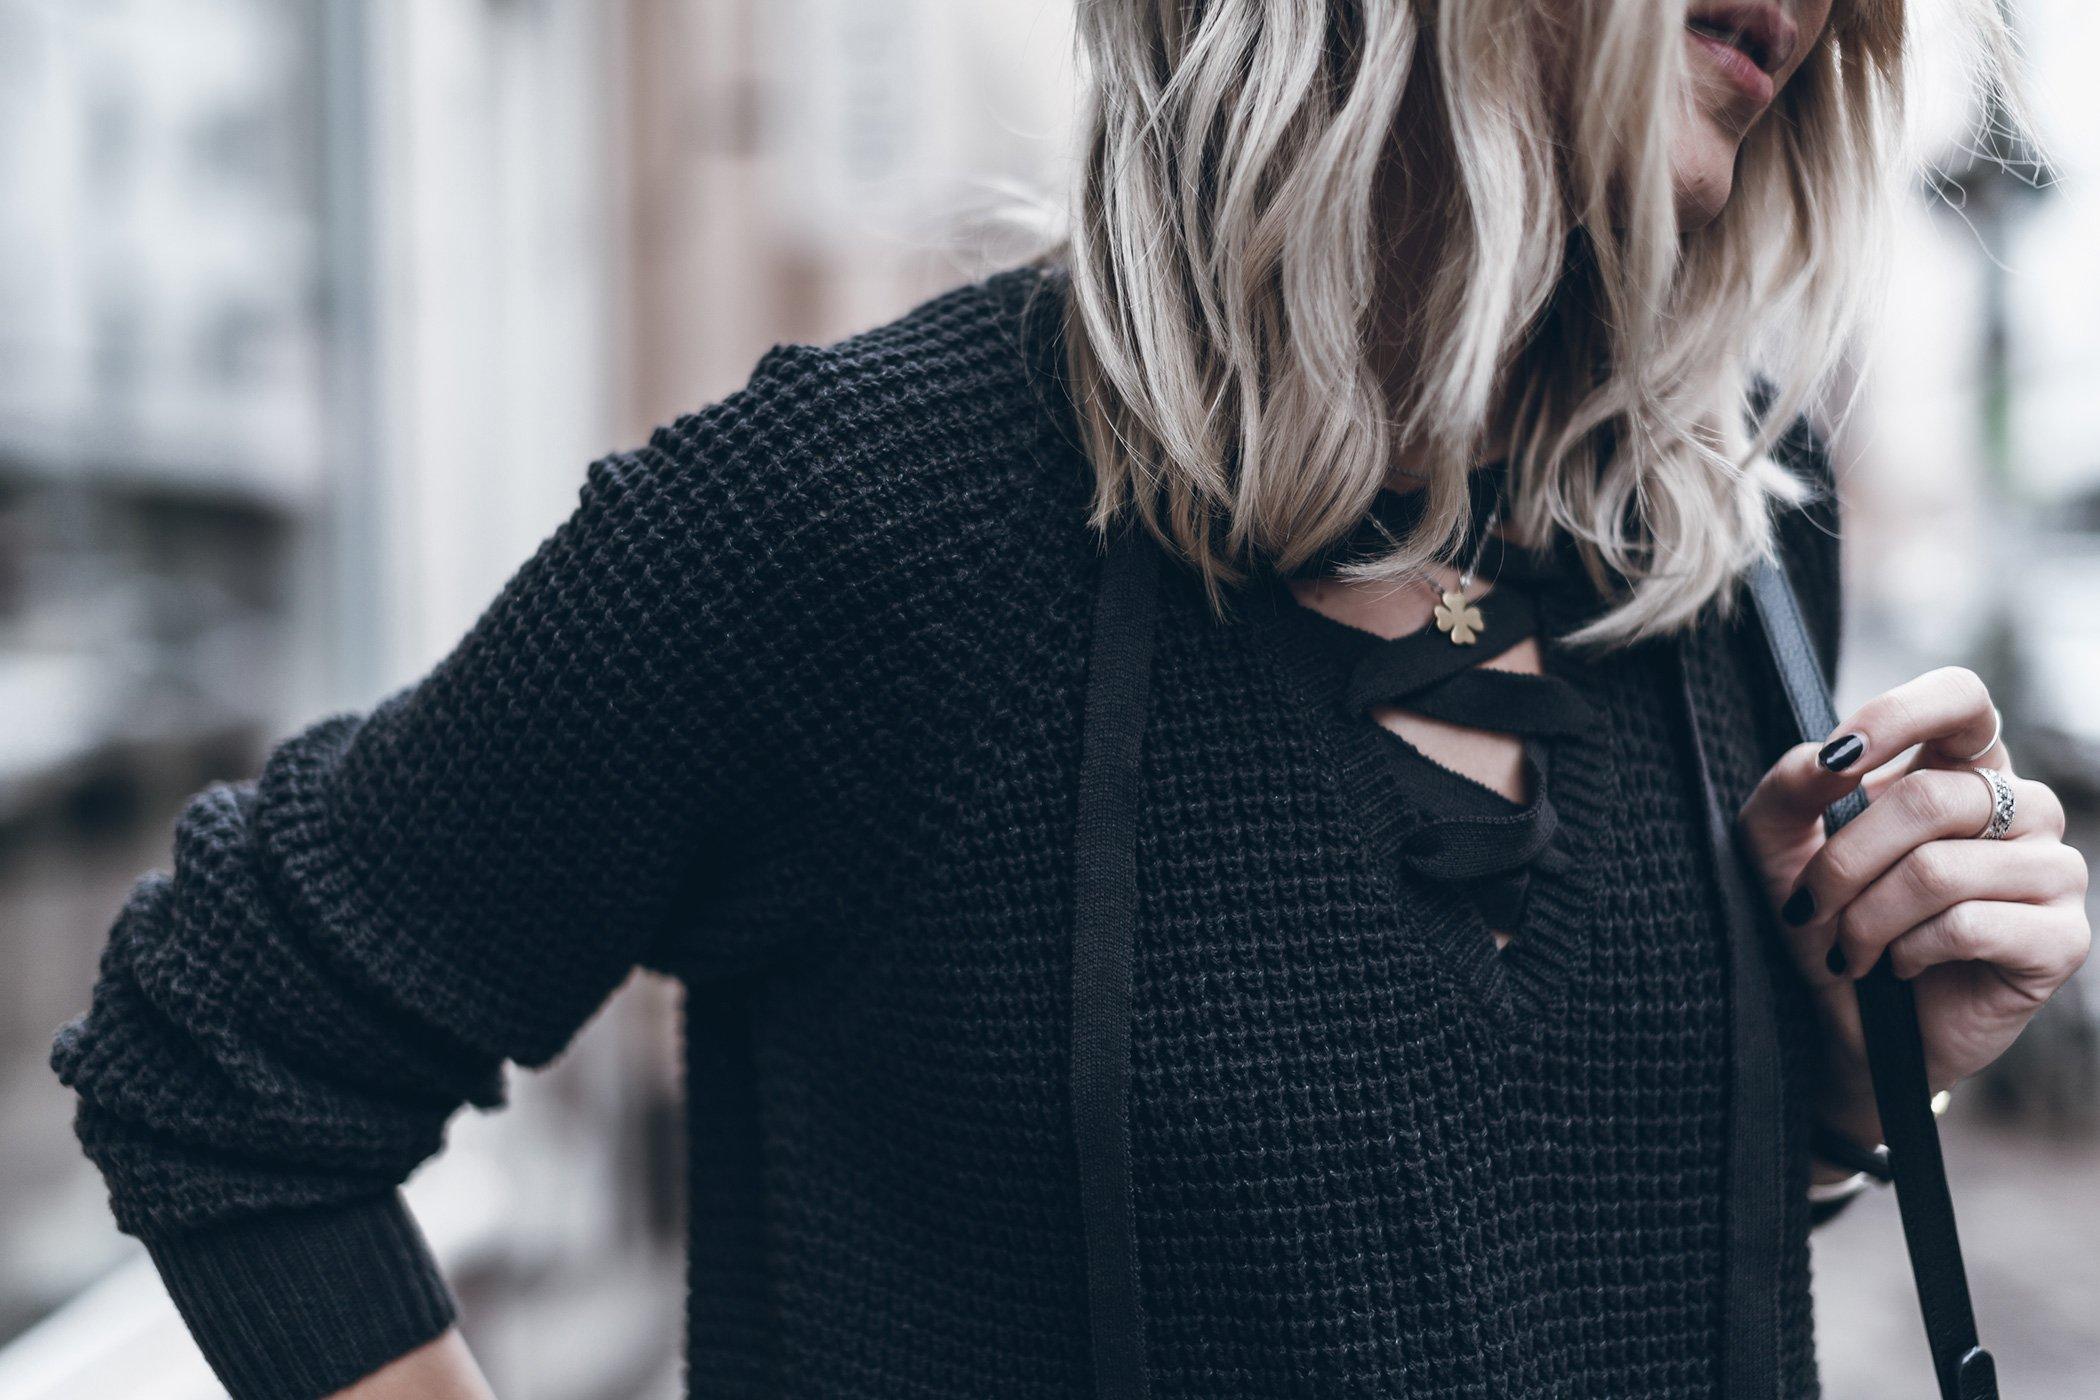 mikuta-vila-jeans-and-sweater-8